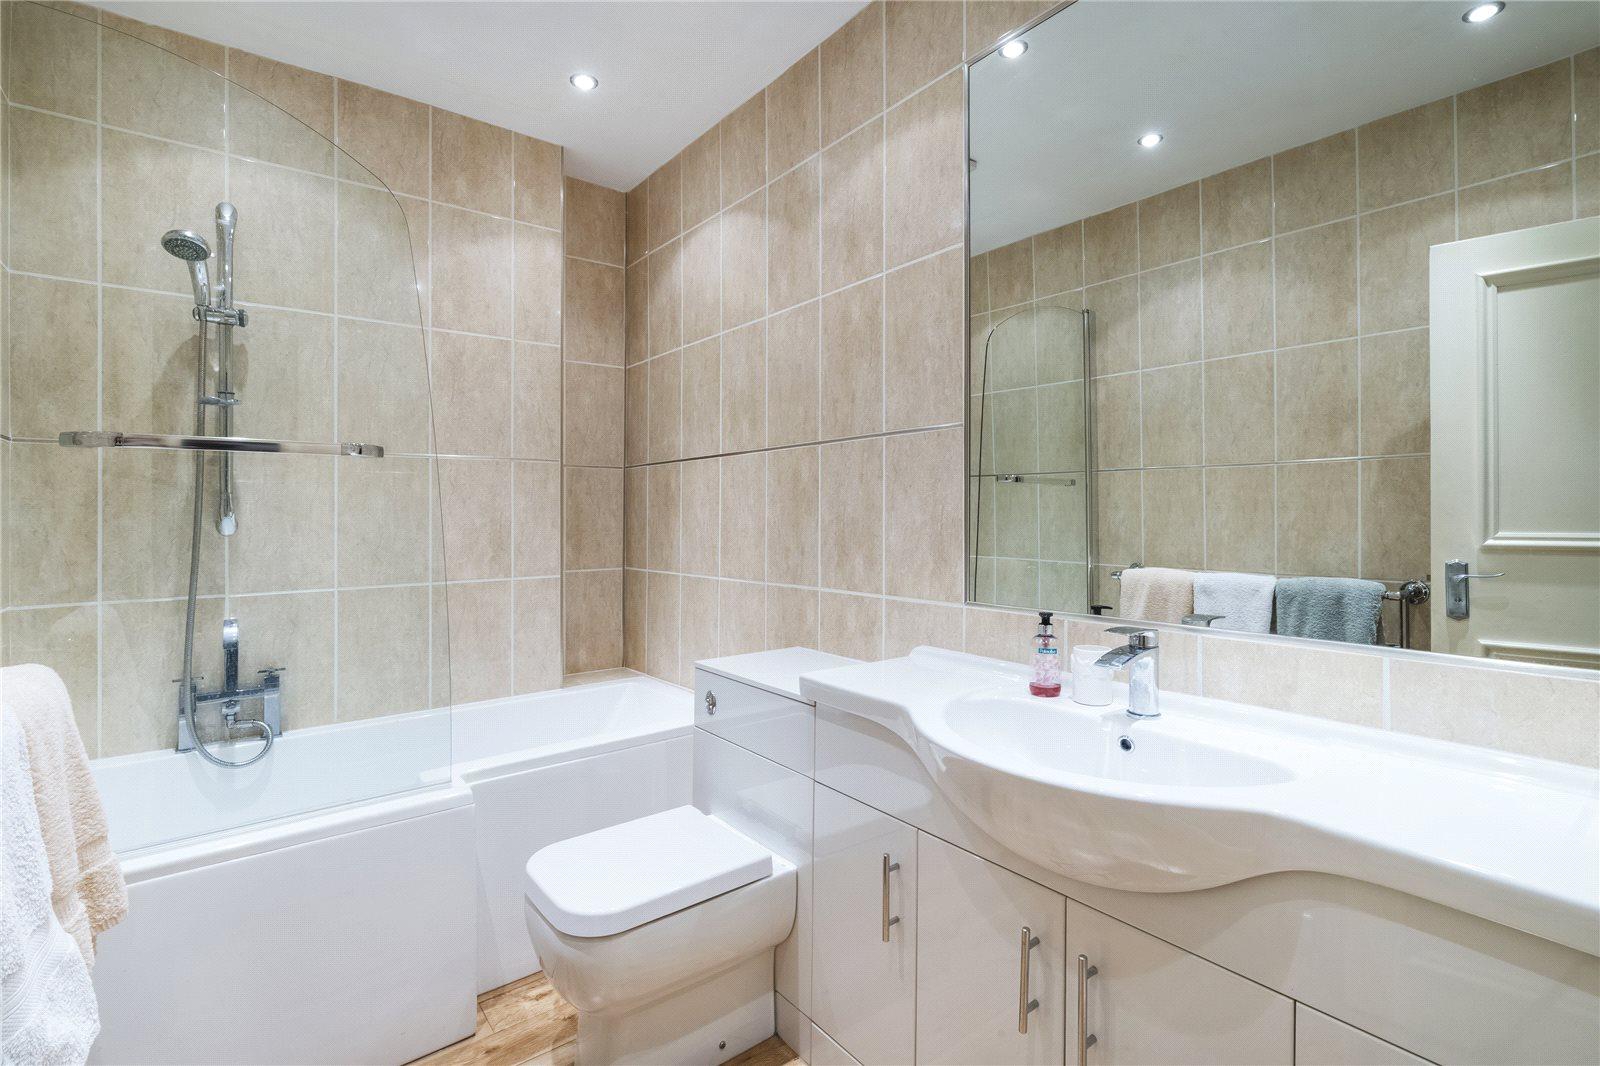 Additional photo for property listing at Manson Place, South Kensington, London, SW7 South Kensington, London, 英格兰